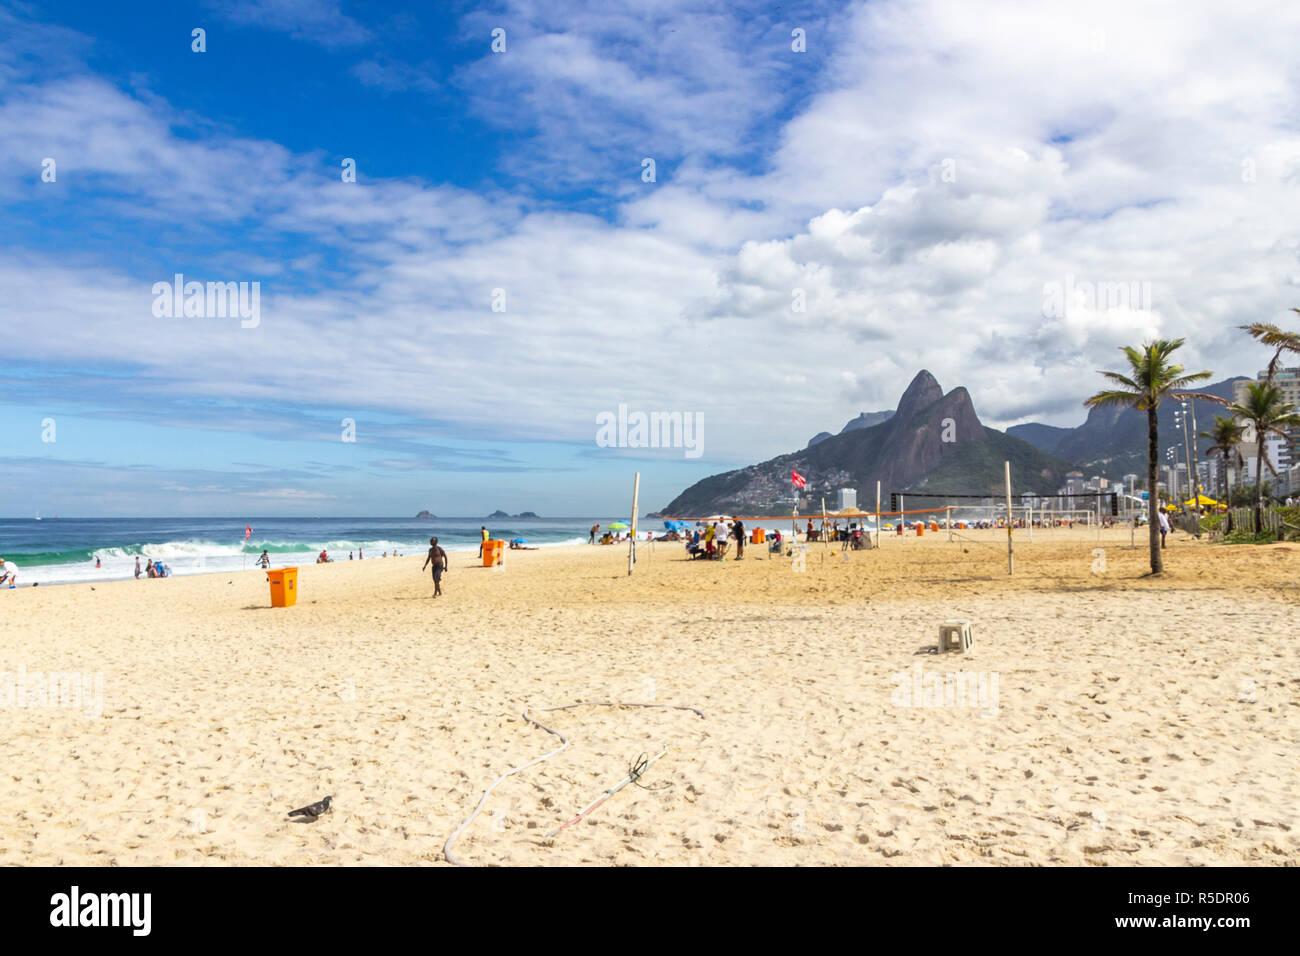 88442bd76 Beach Life In Brazil Stock Photos   Beach Life In Brazil Stock ...